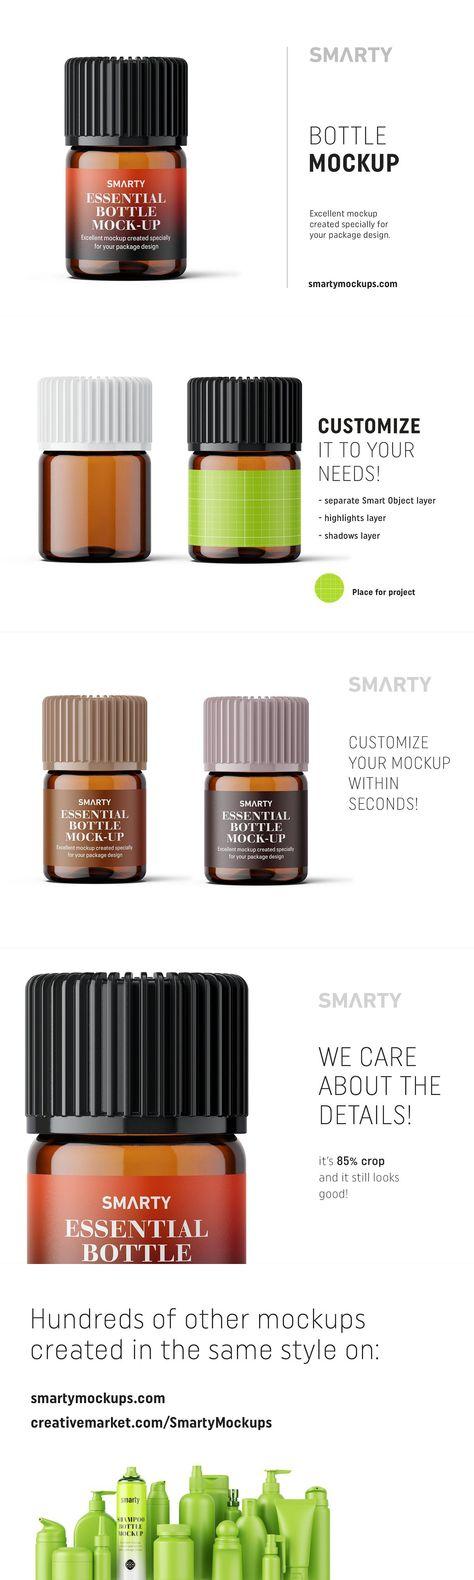 Essential oil bottle mockup 2ml